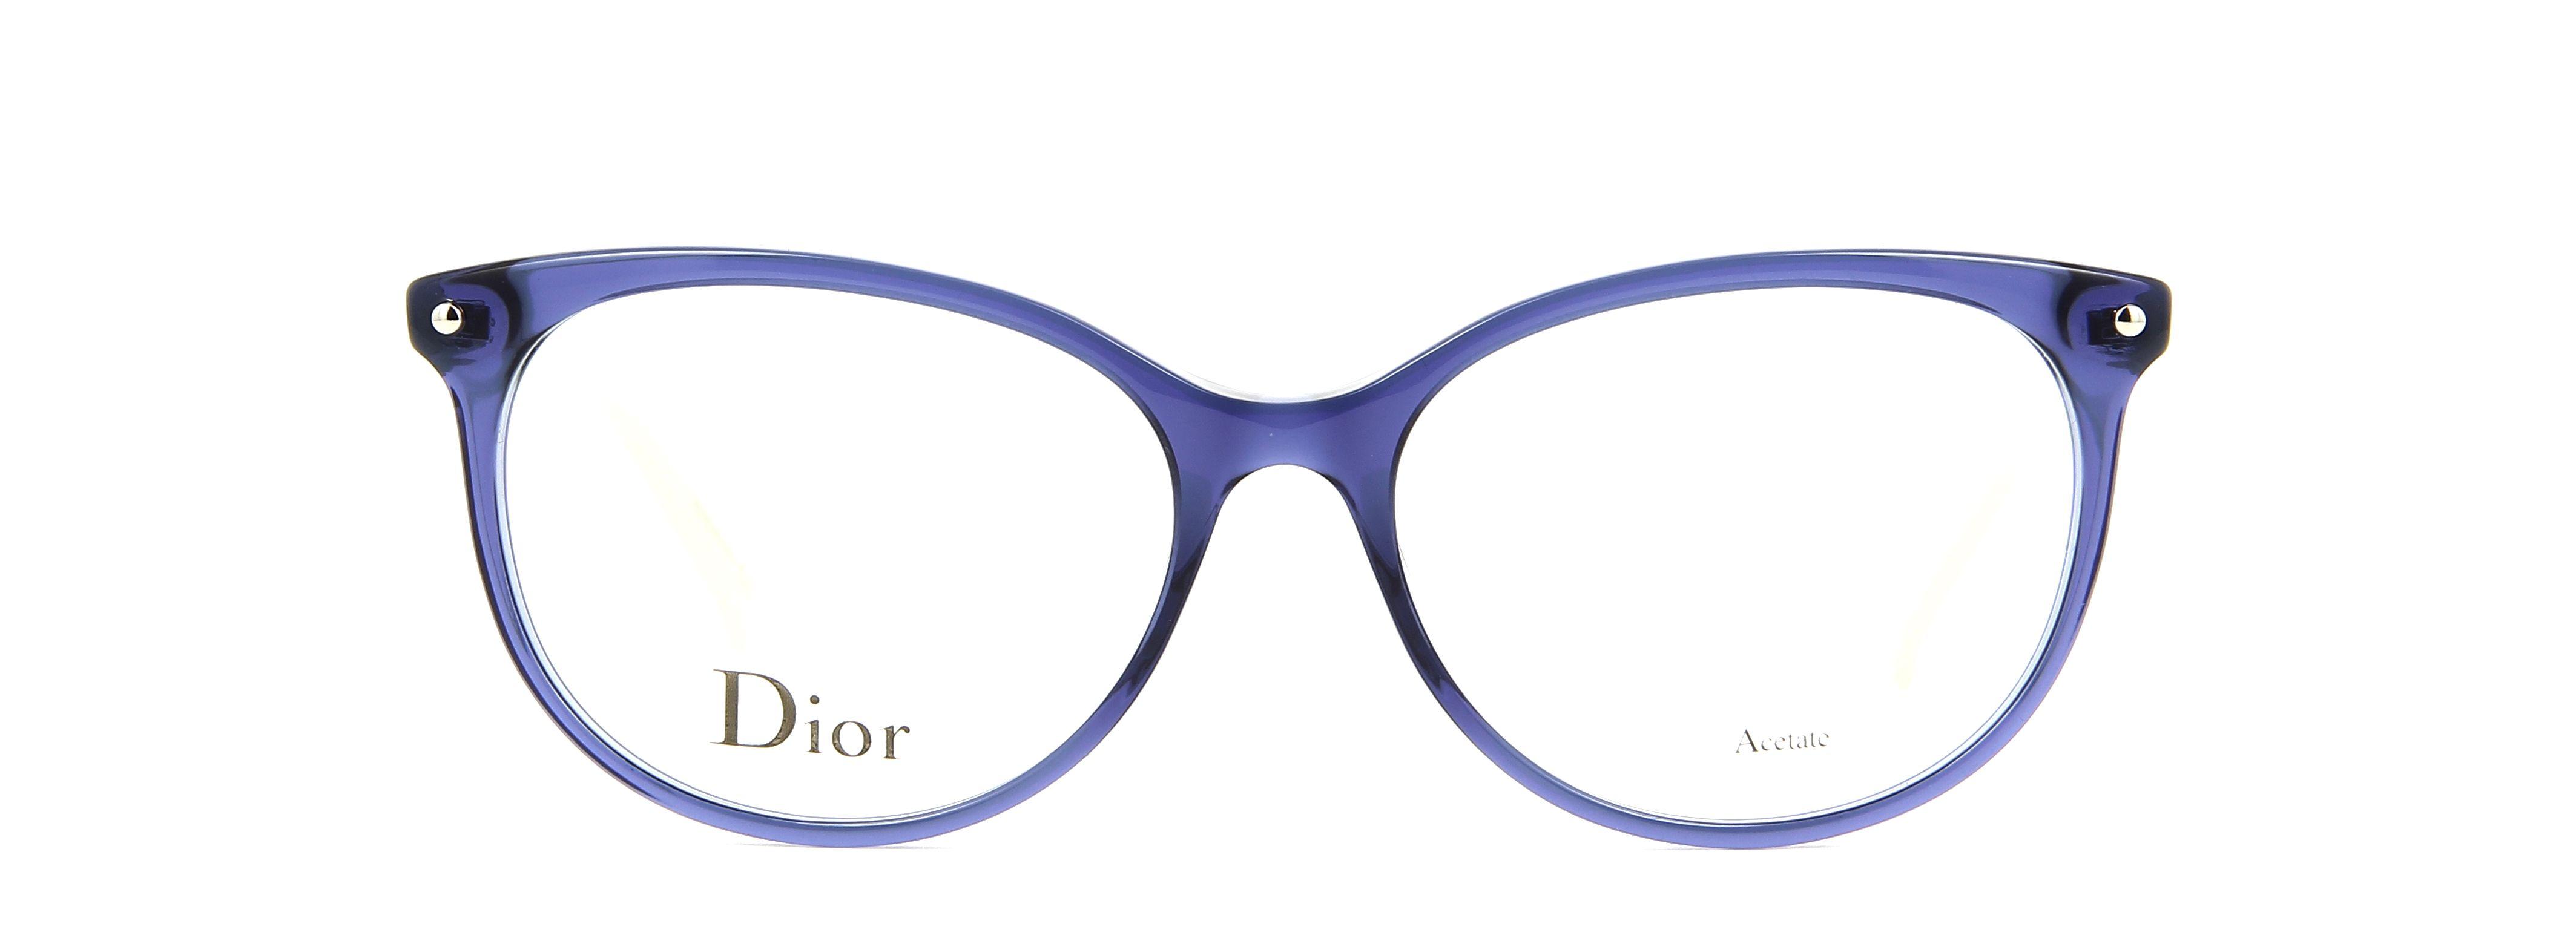 7b858ae792357d Lunettes de vue 0mmx0mm 0€ in 2018   Glasses   Pinterest   Glasses